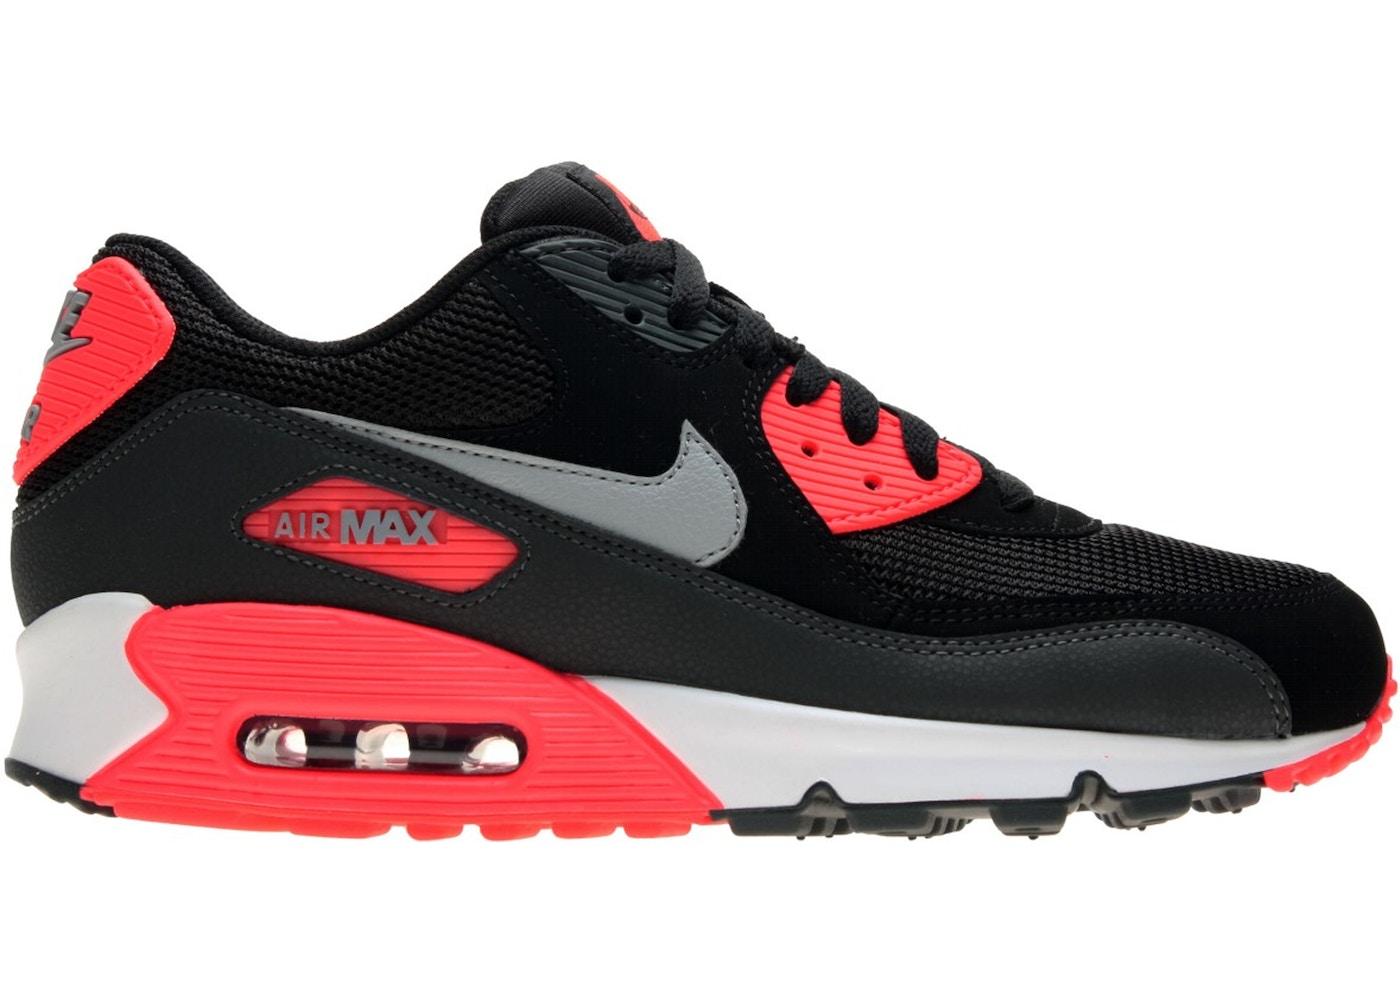 Nike Air Max 90 Black Infrared (2013)